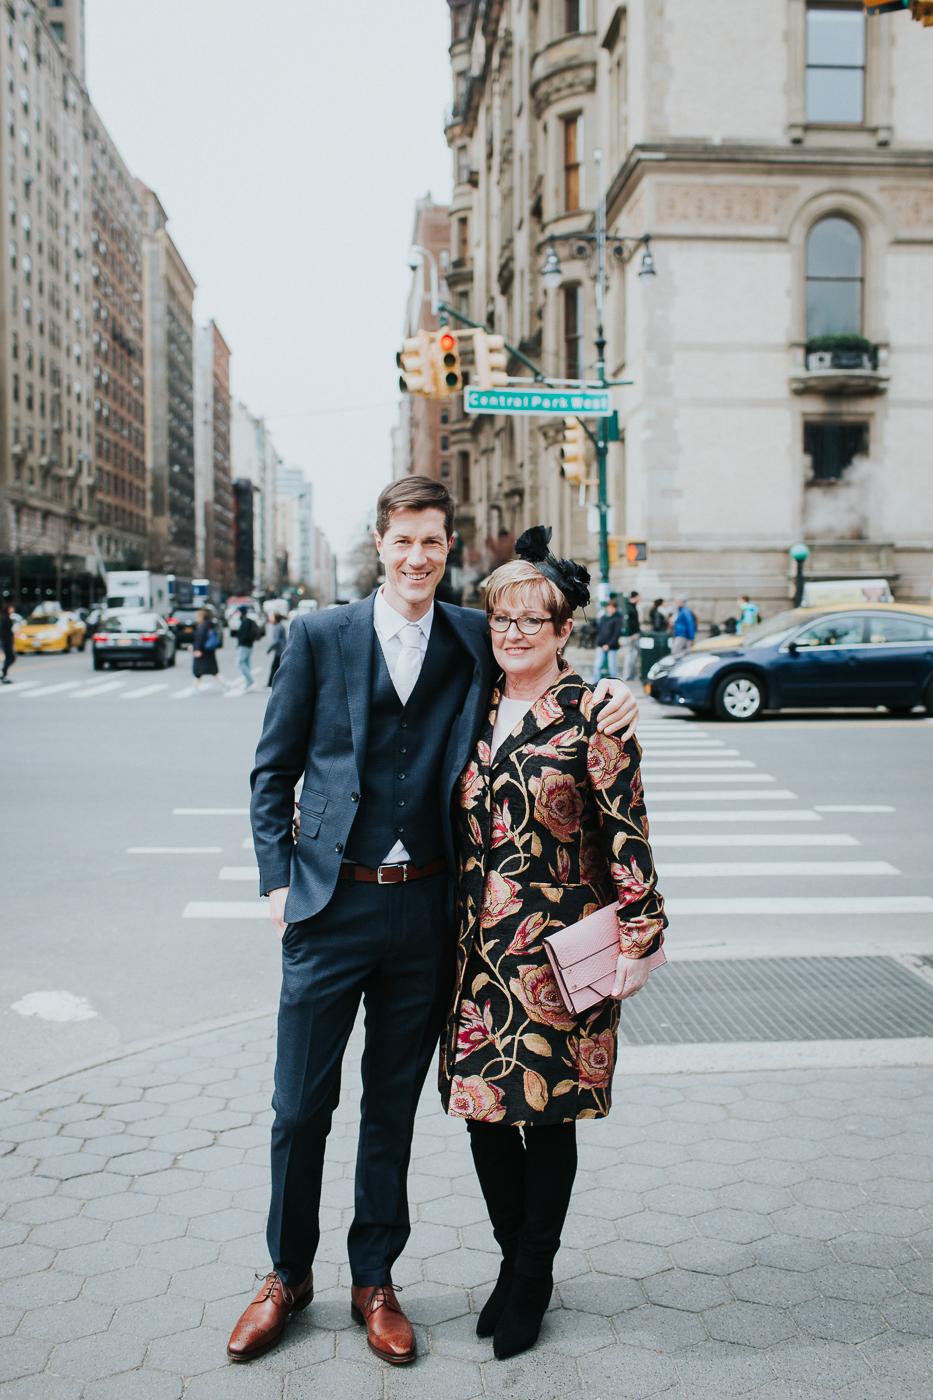 Ladies-Pavilion-Central-Park-NYC-Documentary-Elopement-Wedding-Photographer-6.jpg